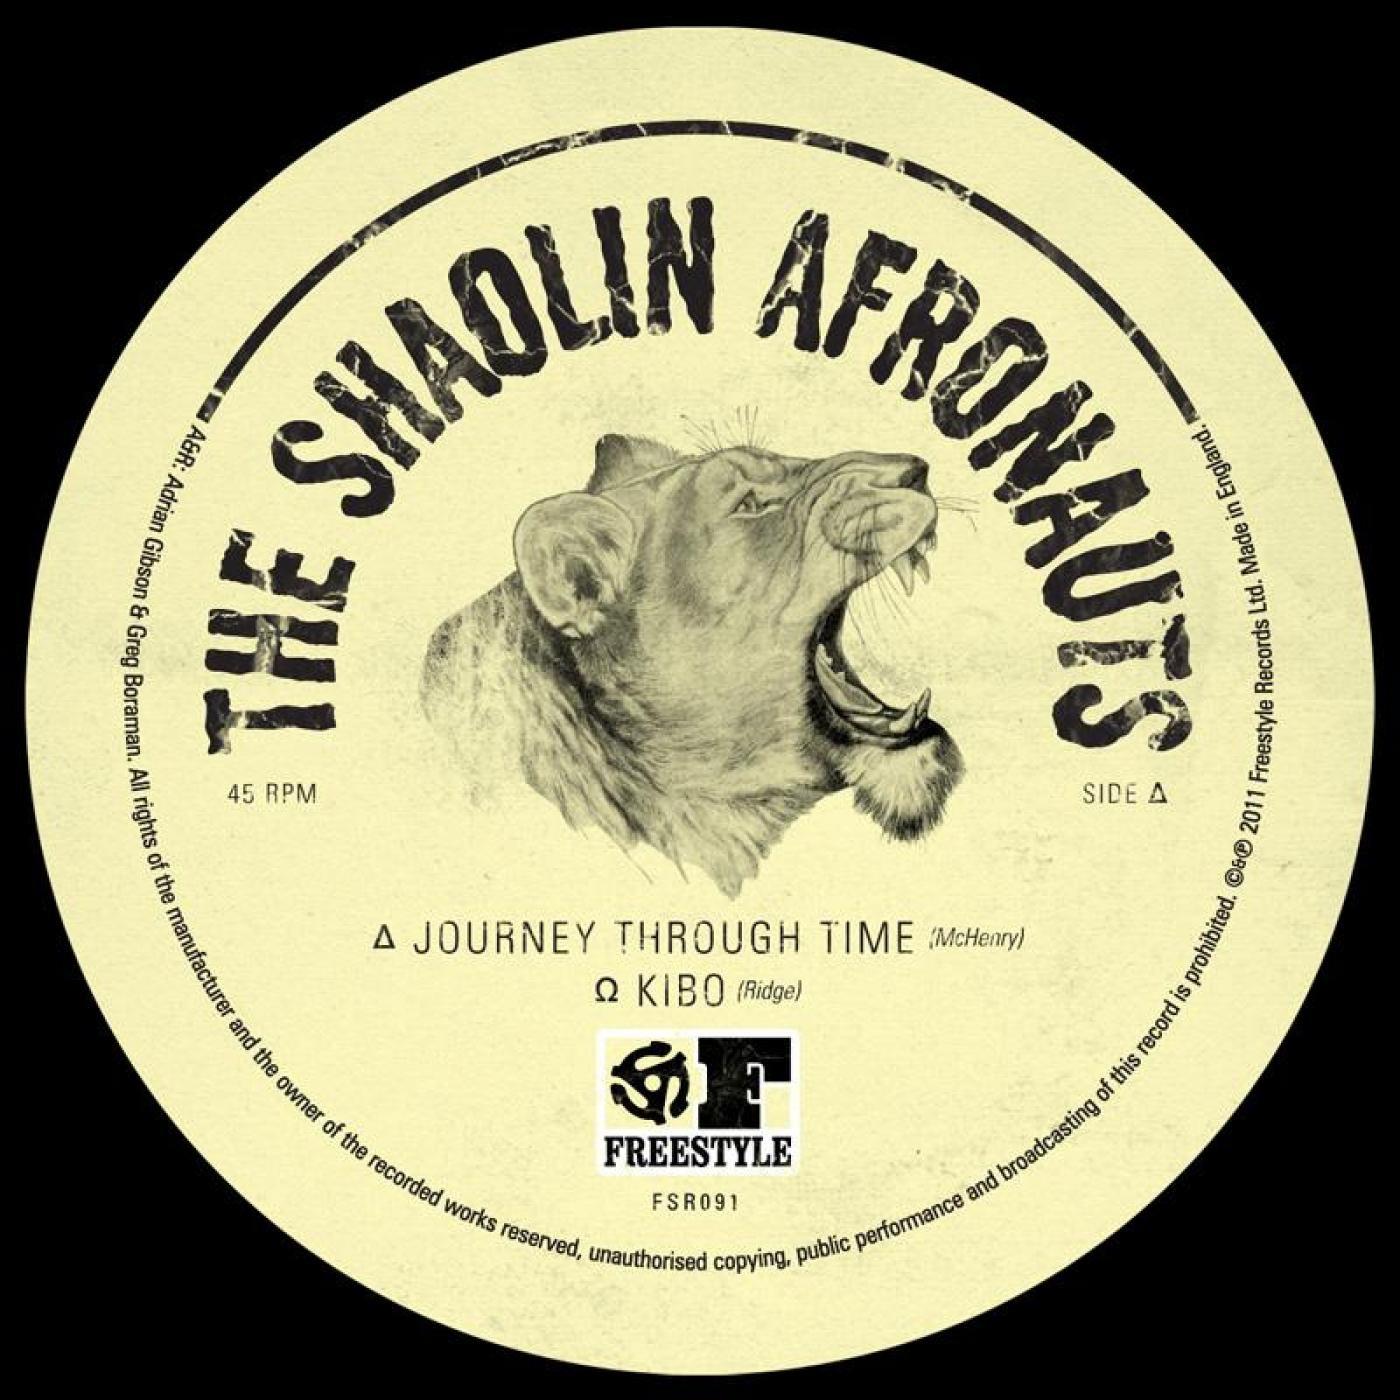 Journey Through Time The Shaolin Afronauts Kudos Records